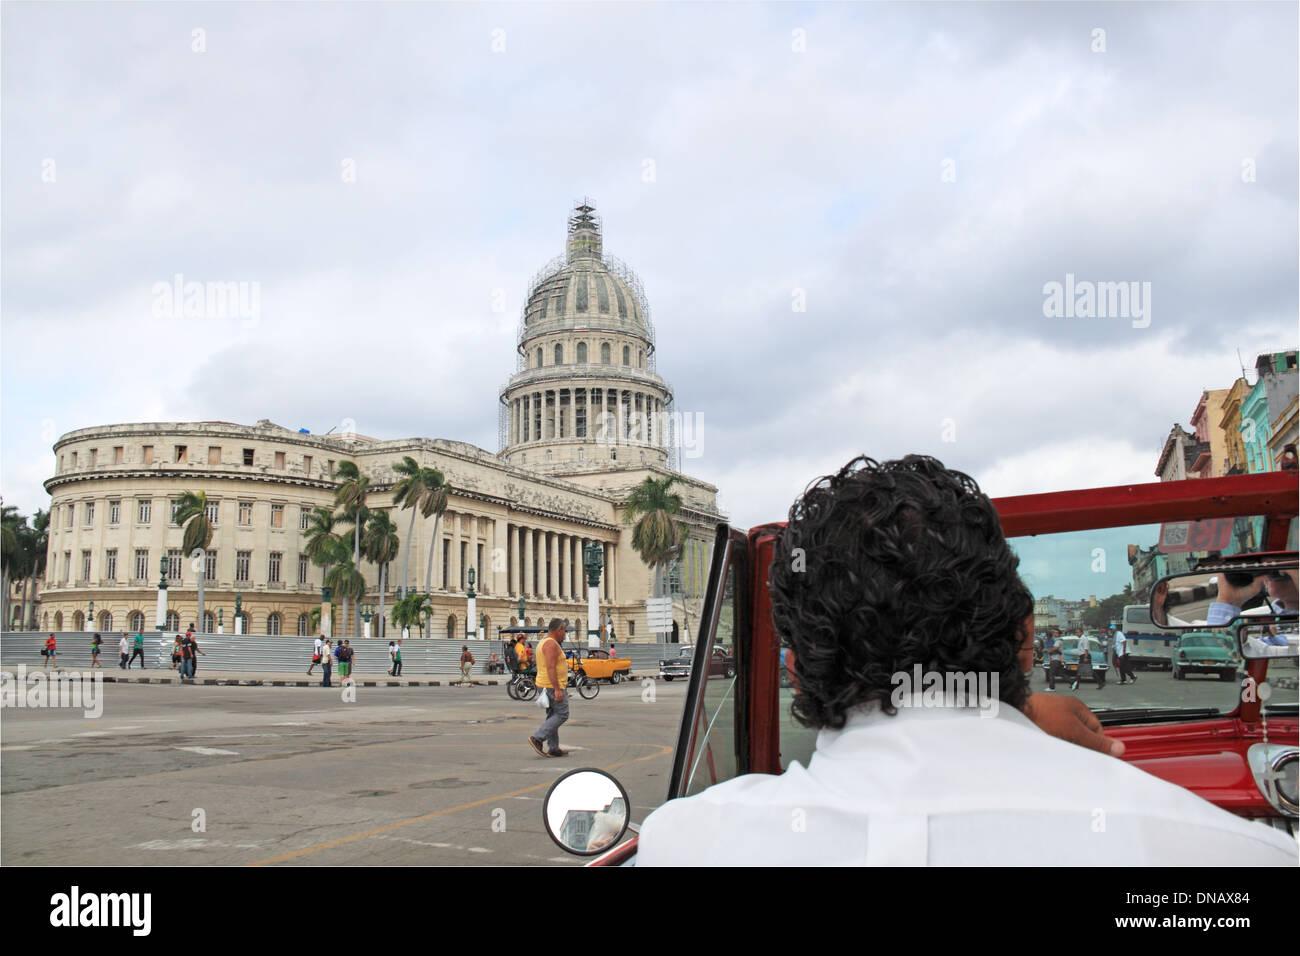 Capitolio, Paseo de Martí (aka Paseo del Prado), Old Havana (La Habana Vieja), Cuba, Caribbean Sea, Central America - Stock Image